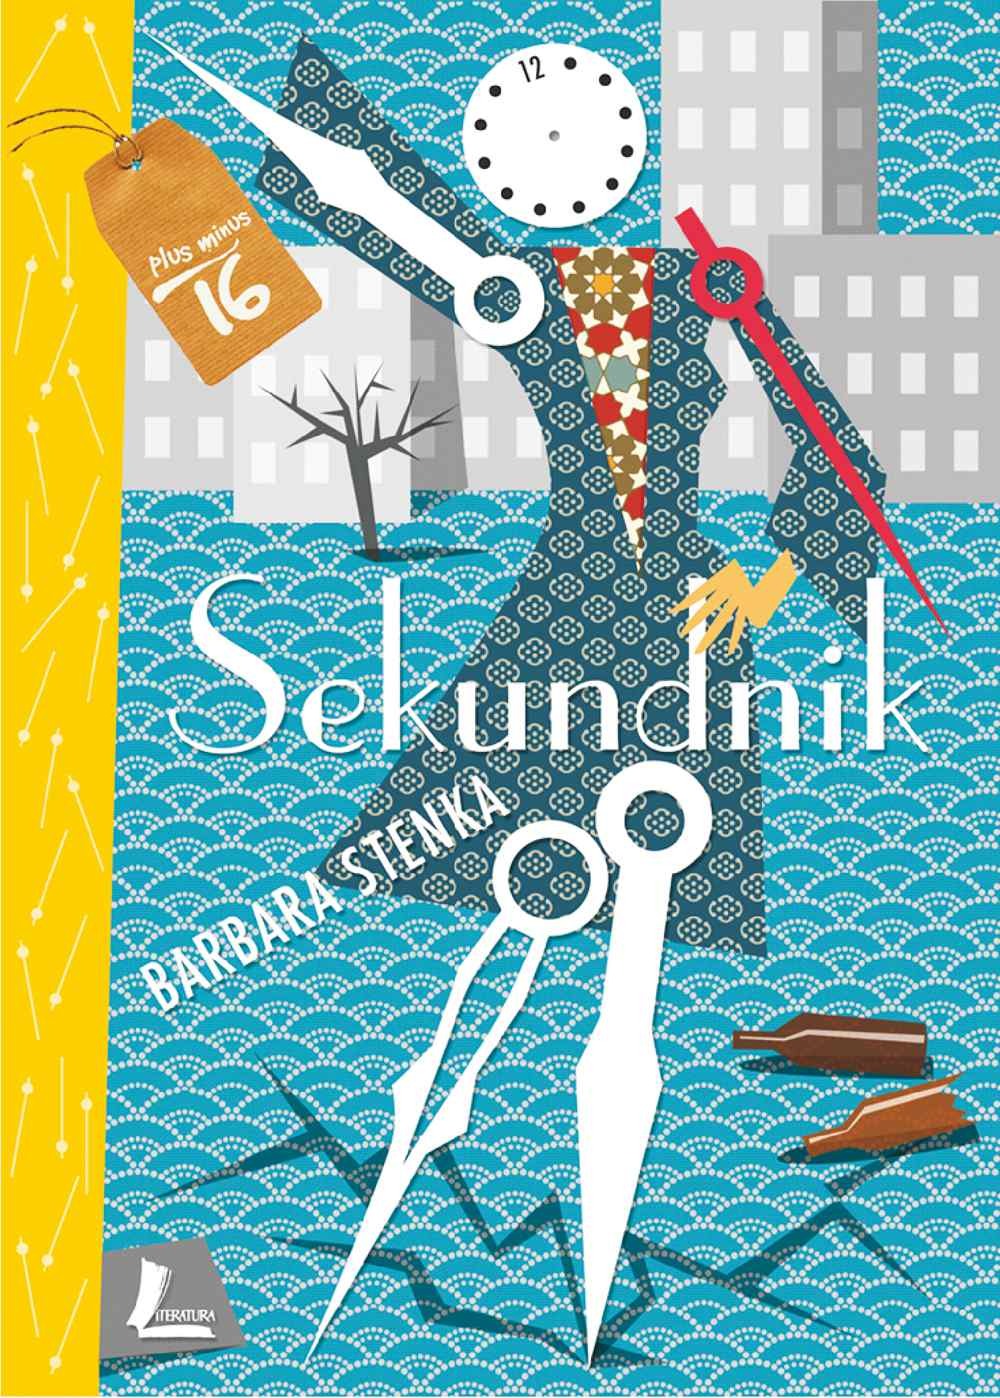 Sekundnik - Ebook (Książka na Kindle) do pobrania w formacie MOBI